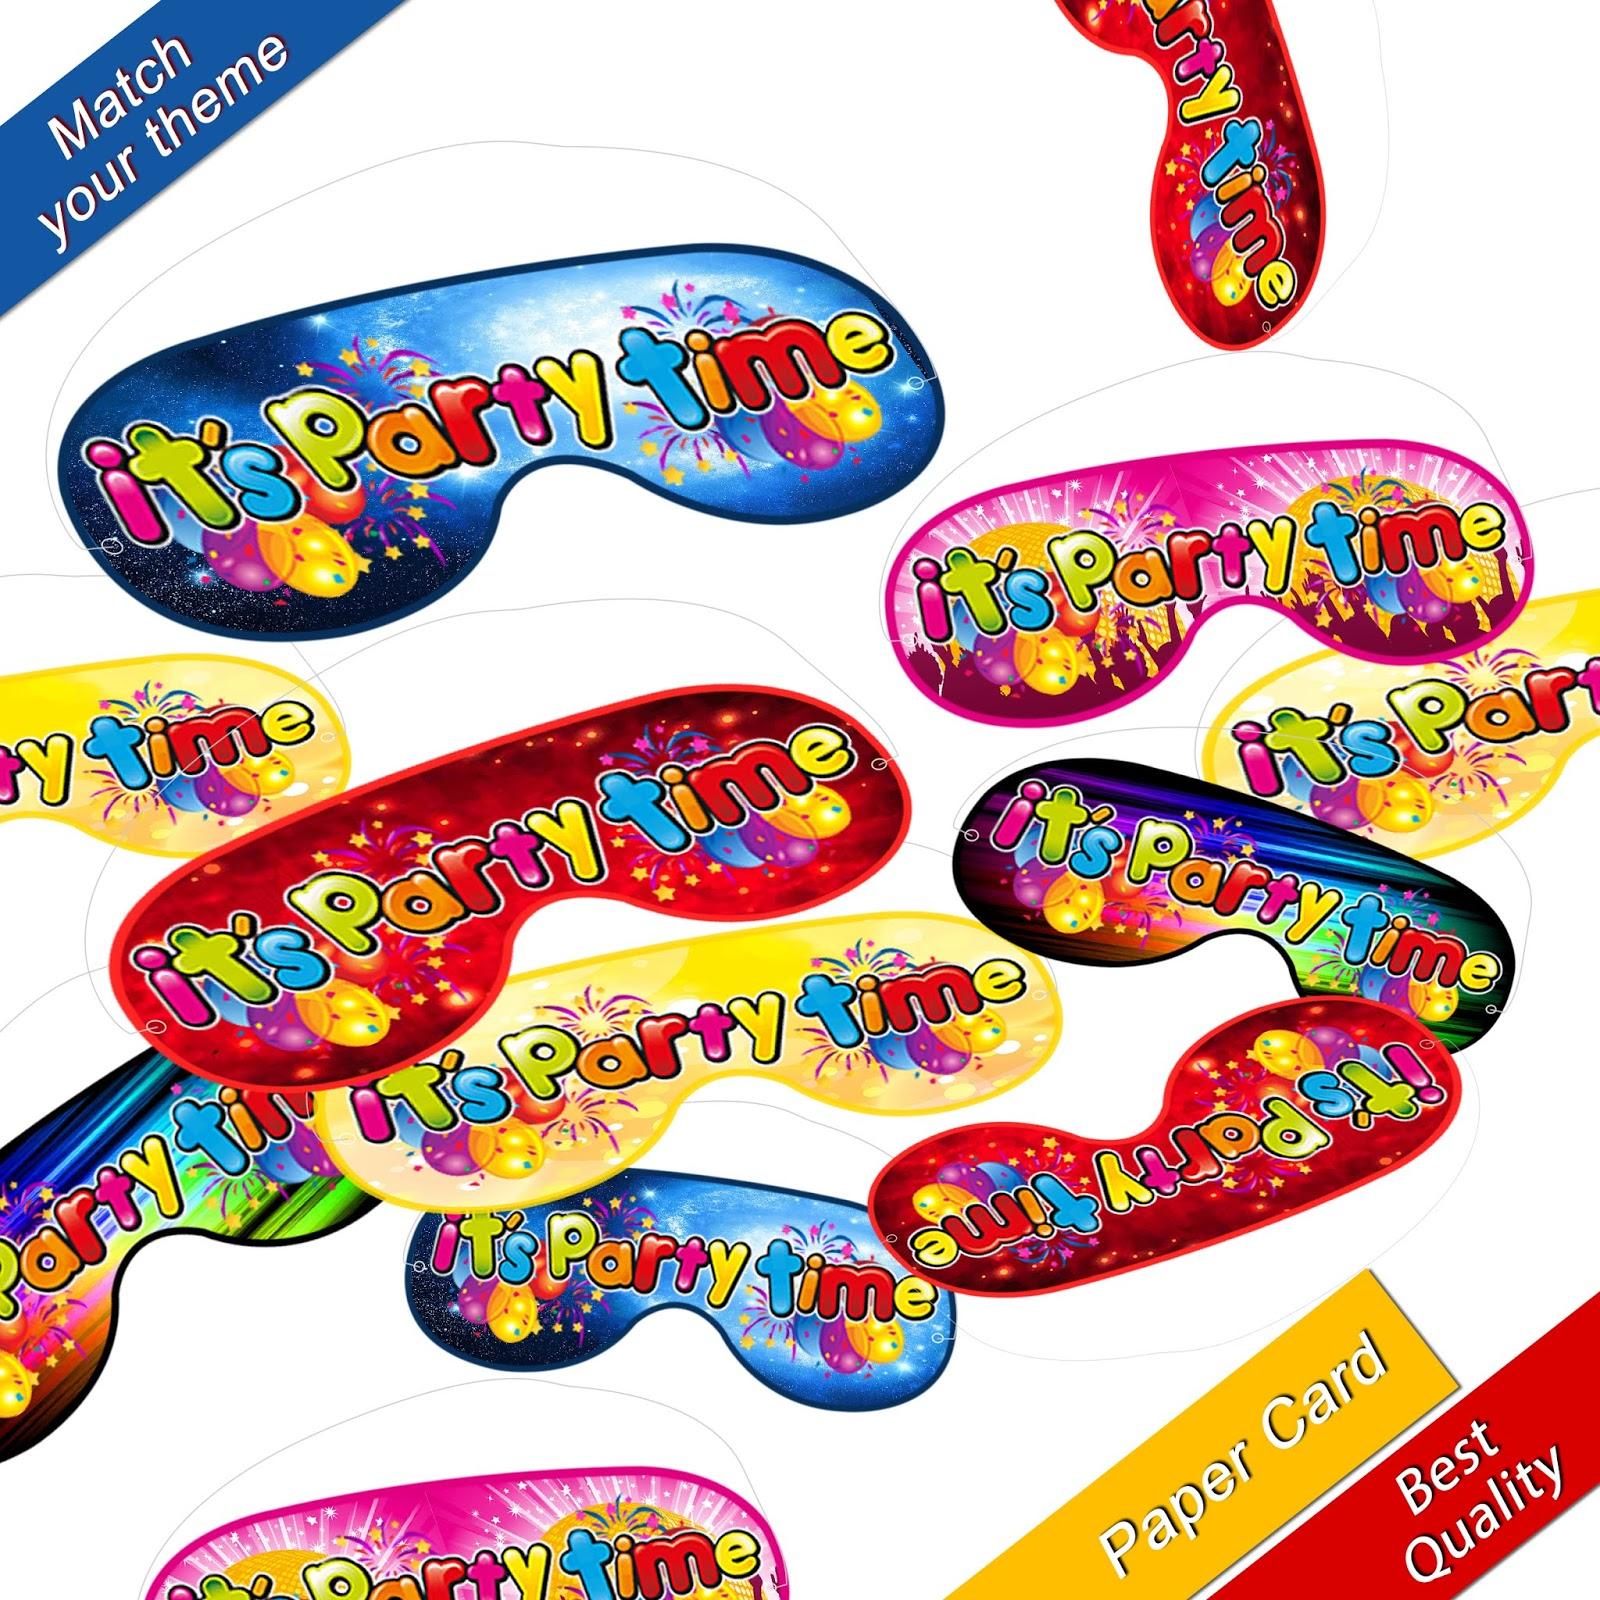 Pinata Buster Stick Blindfold Smash Party hitting bat mask boy bash pink blue UK